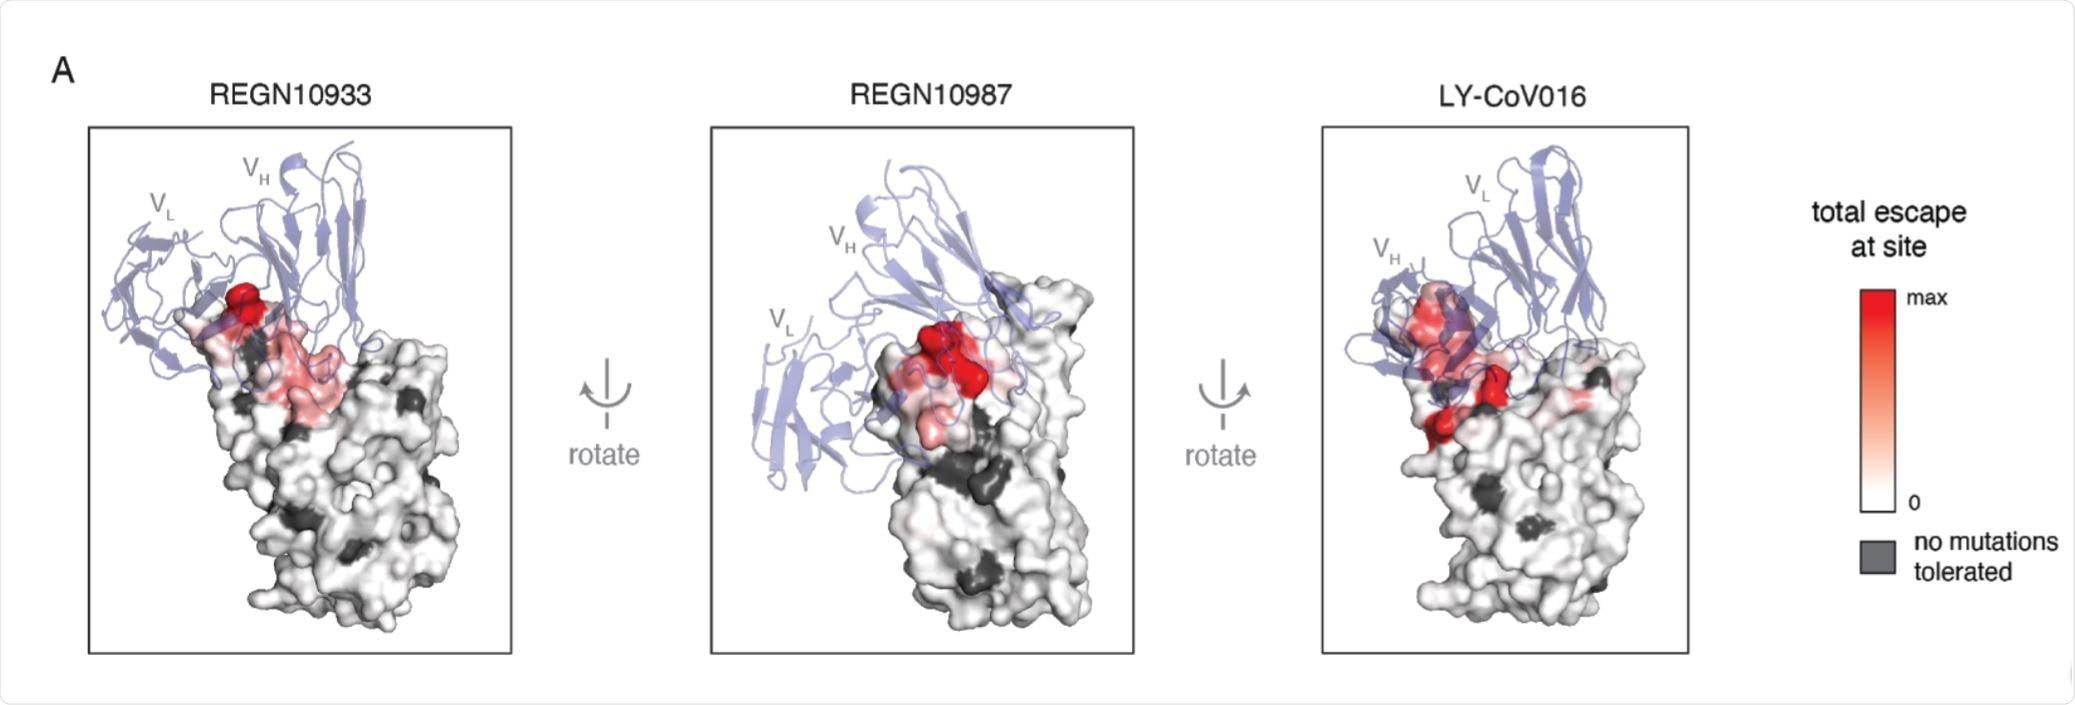 Structural context of escape mutations.